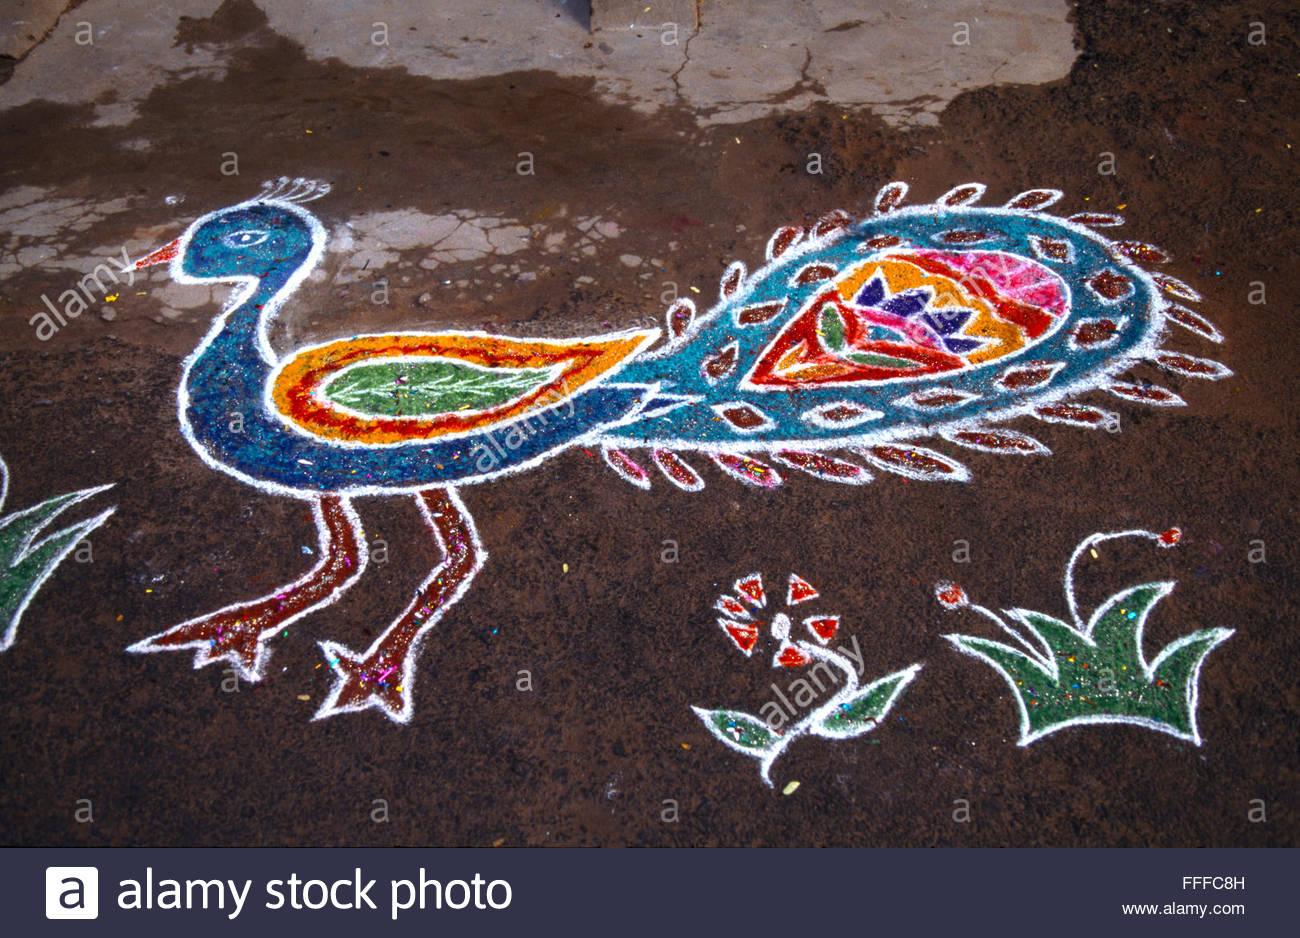 best pongal kolam competition tiruvannamalai tamil nadu india - Stock Image